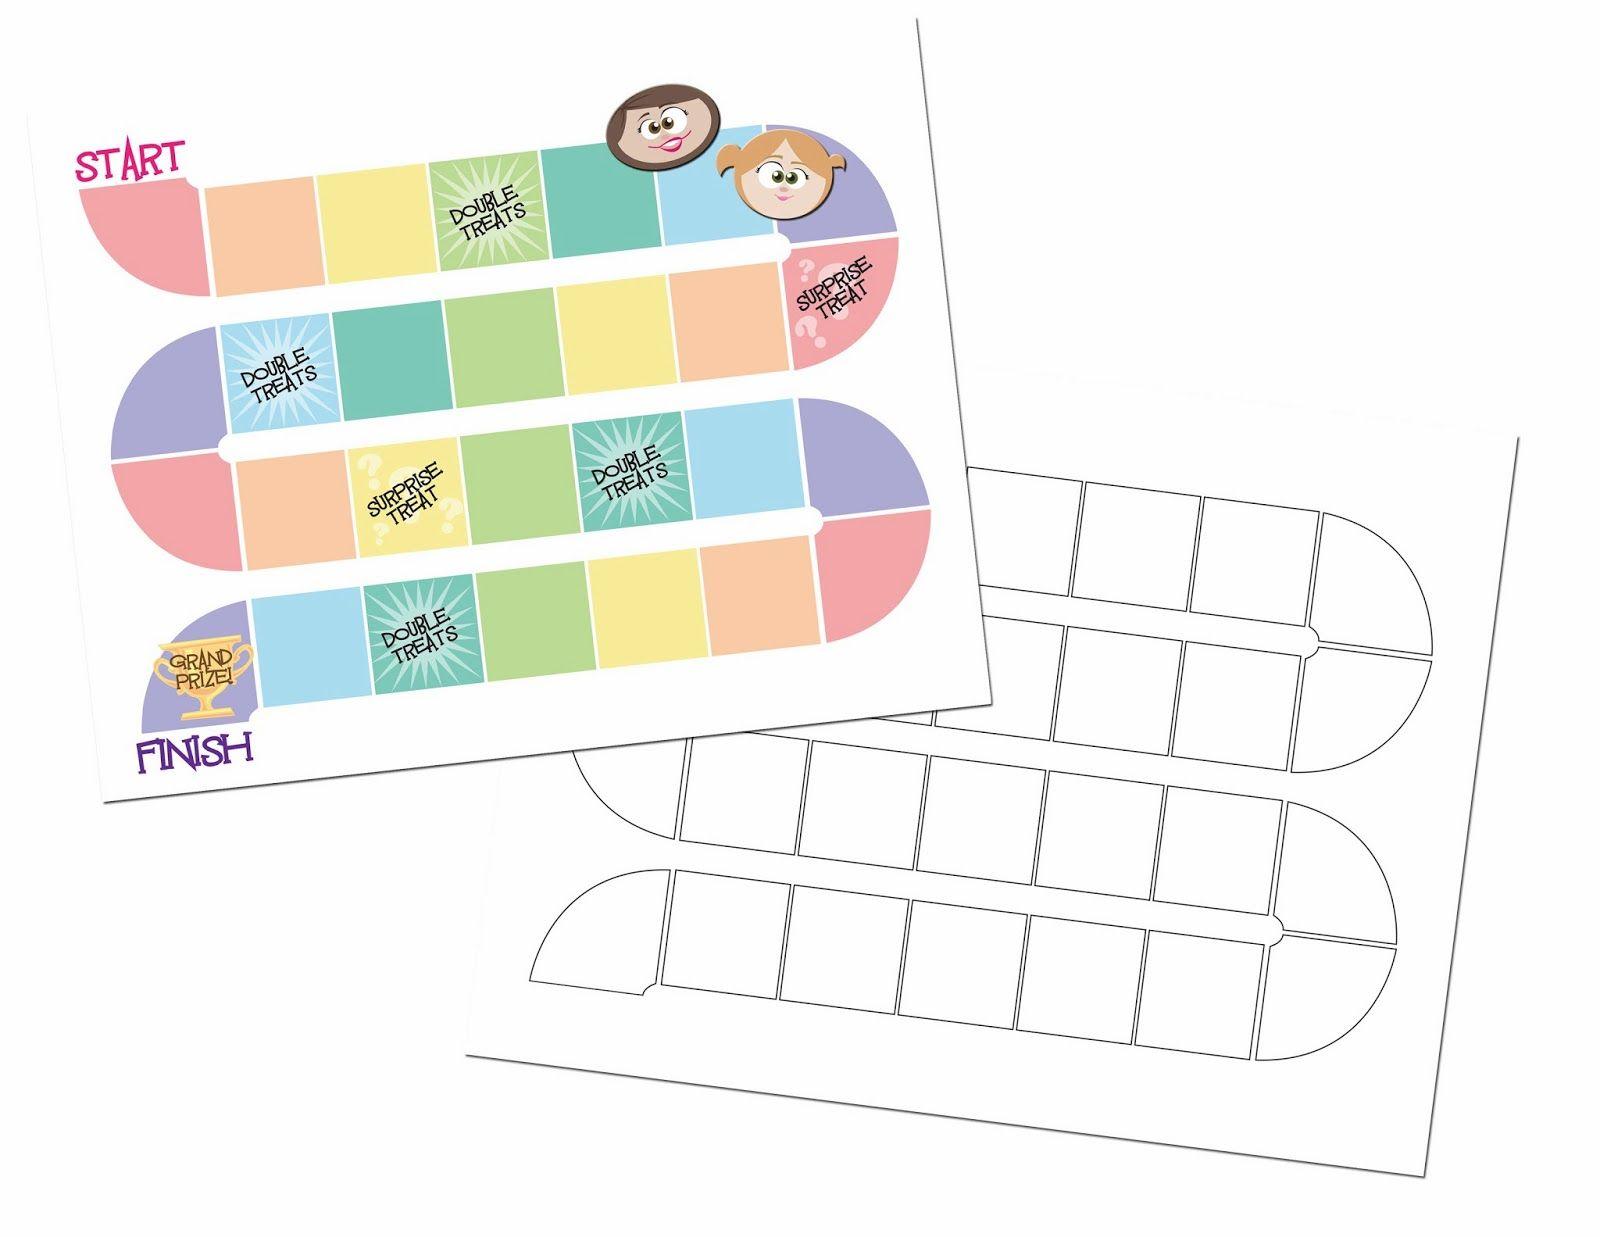 Generic Game Board Board Game Template Free Board Games Blank